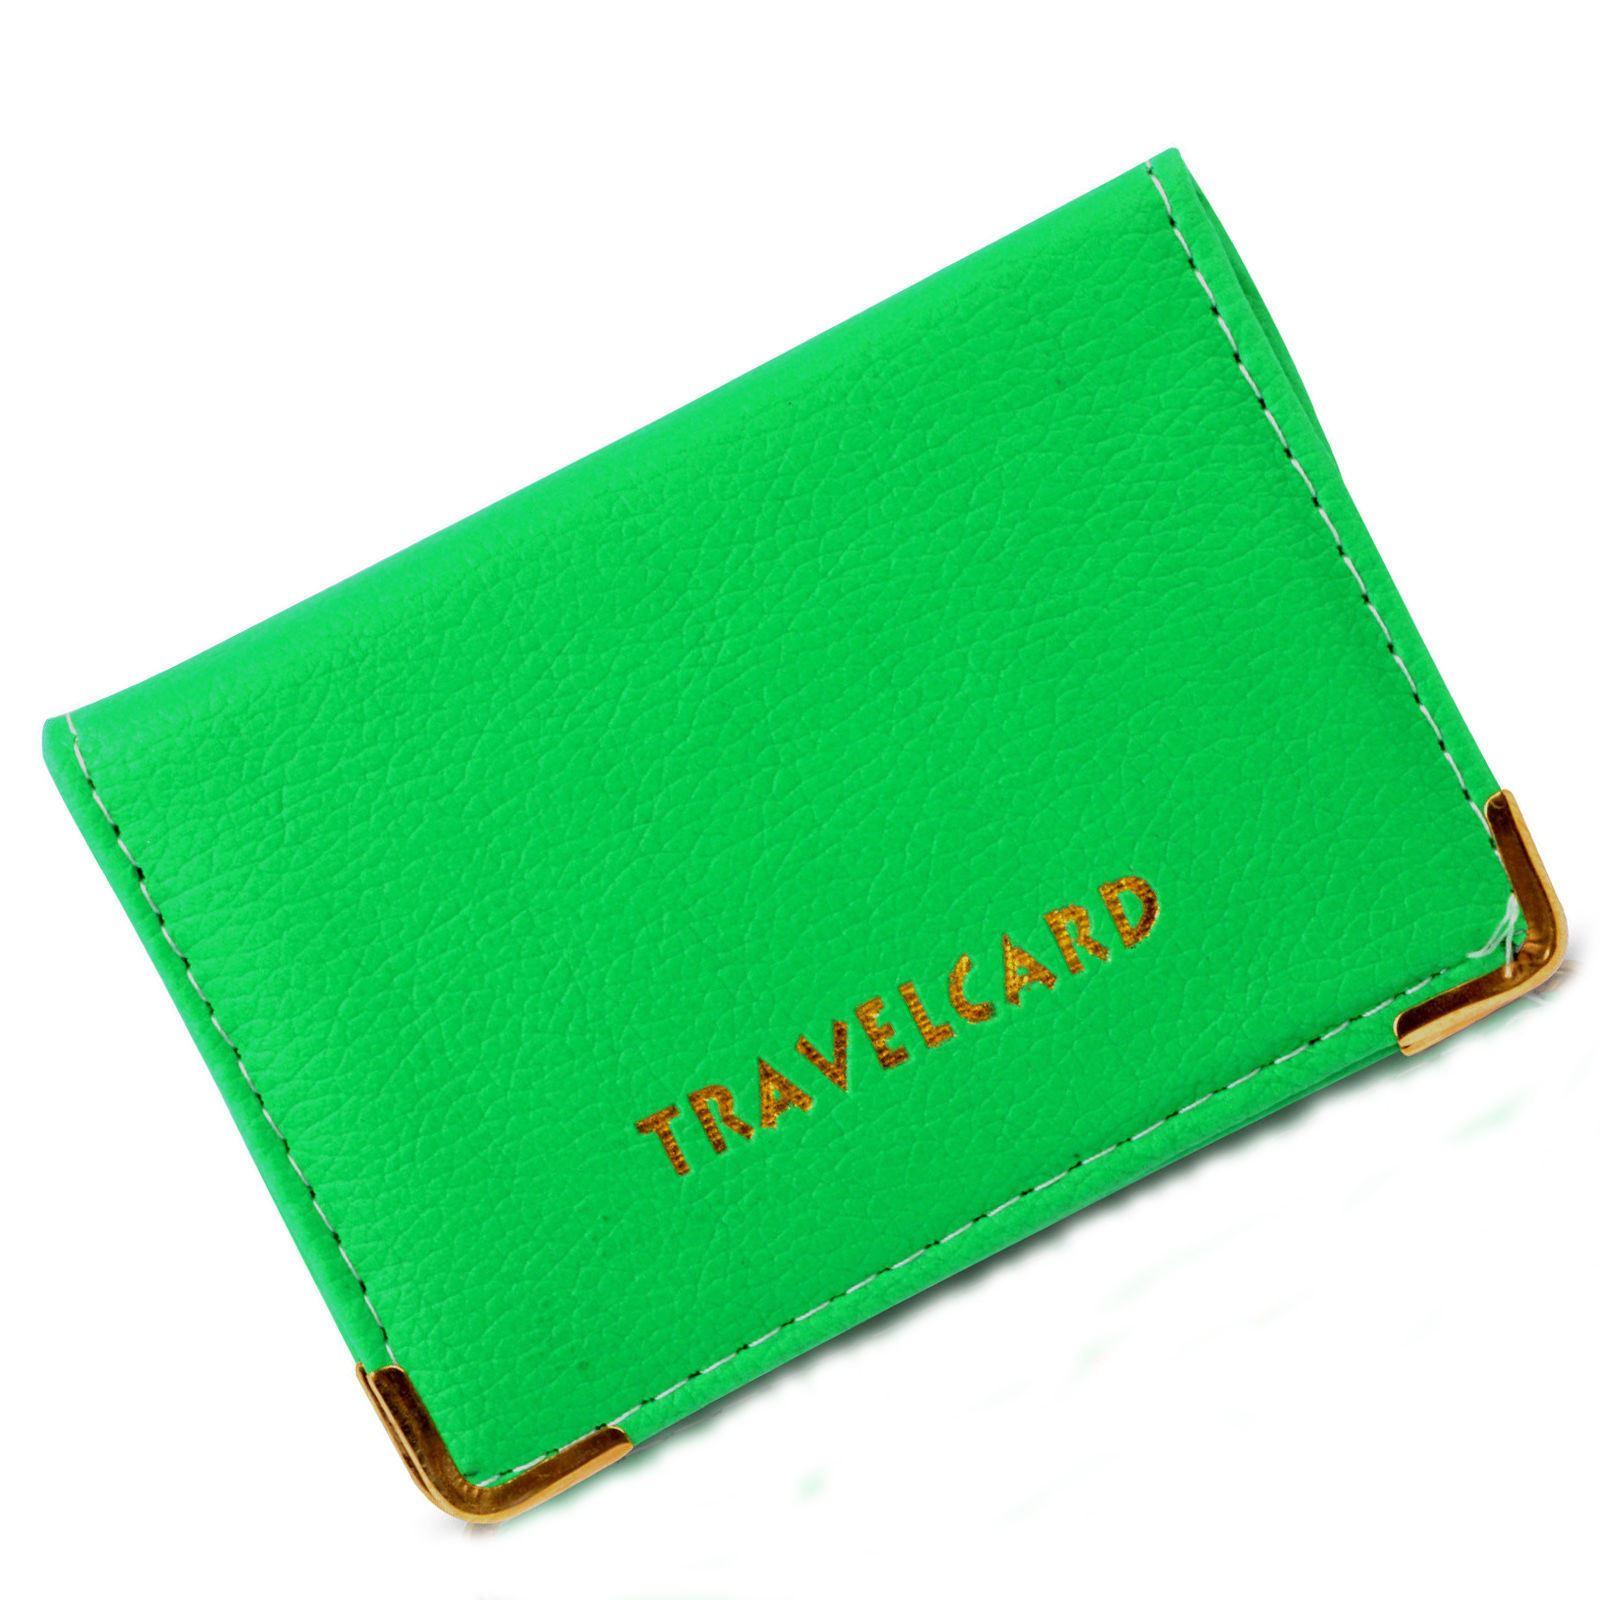 travel card oyster credit card bus pass id card wallet case cover carrier holder ebay. Black Bedroom Furniture Sets. Home Design Ideas